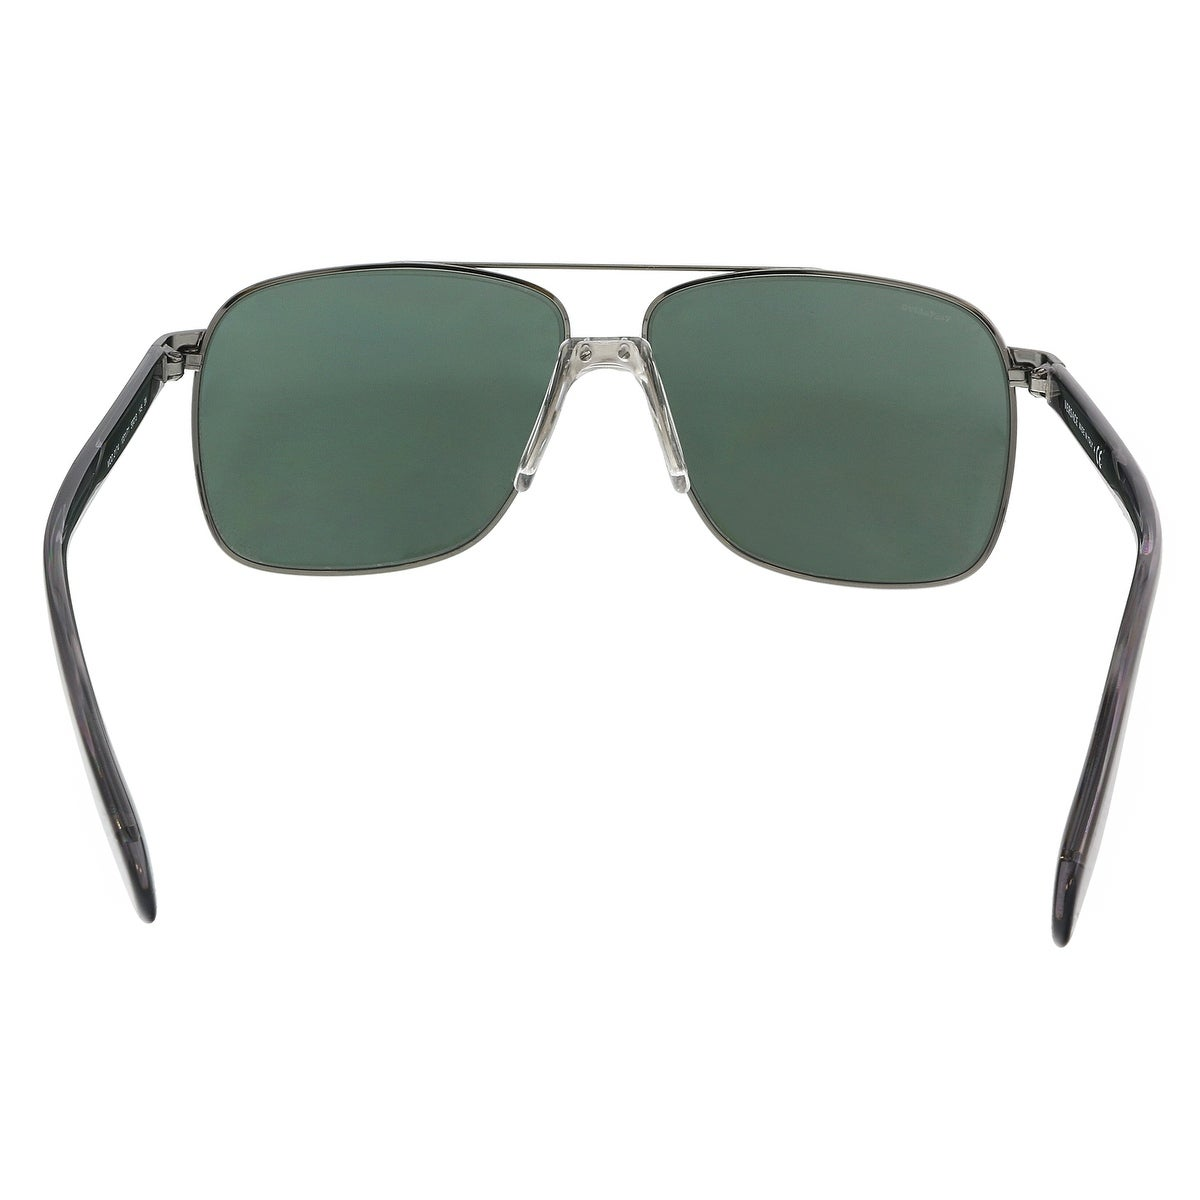 b5138e60a806 Shop Versace VE2174 100171 Gunmetal Rectangle Sunglasses - 59-13-145 - Free  Shipping Today - Overstock - 21655842